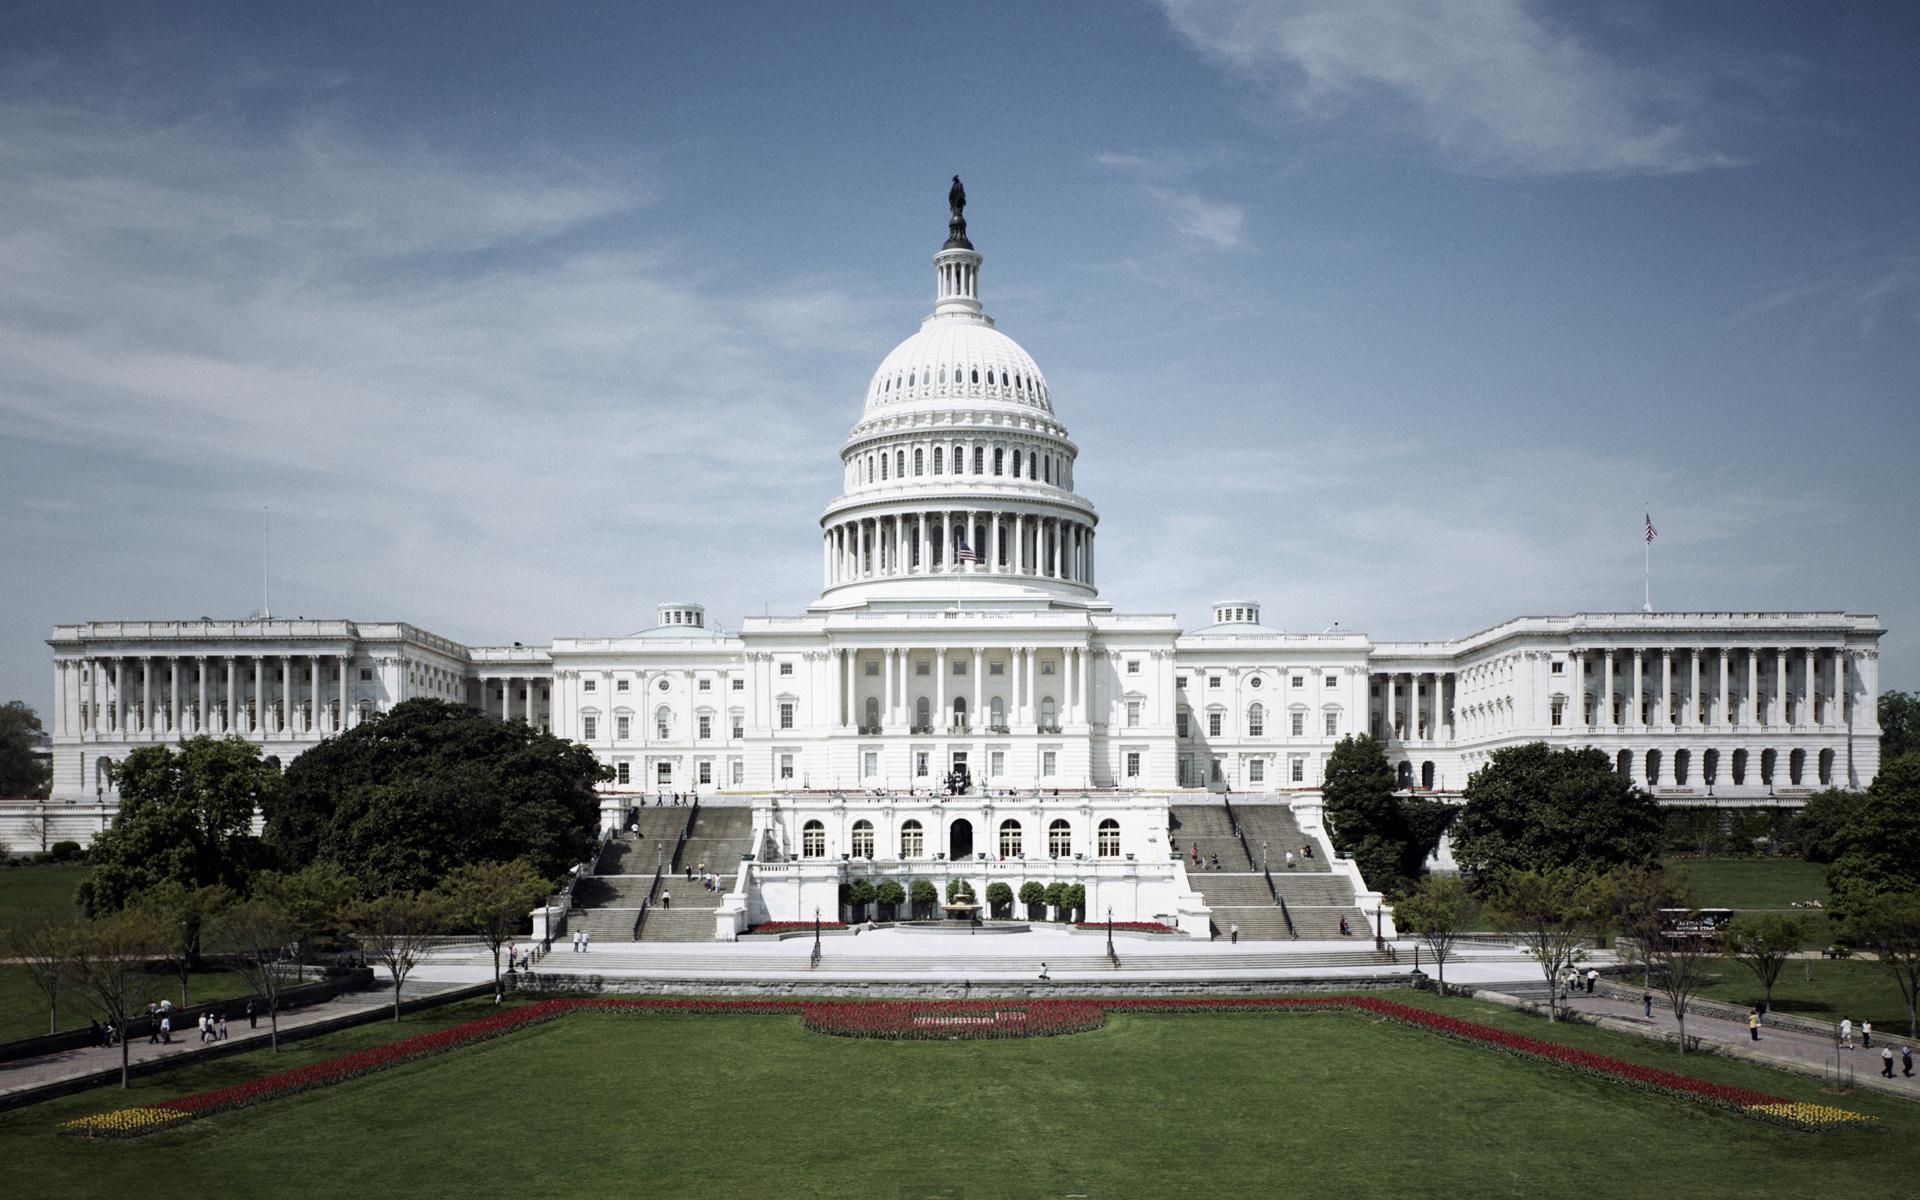 Best 40 United States Congress Wallpaper on HipWallpaper 1920x1200